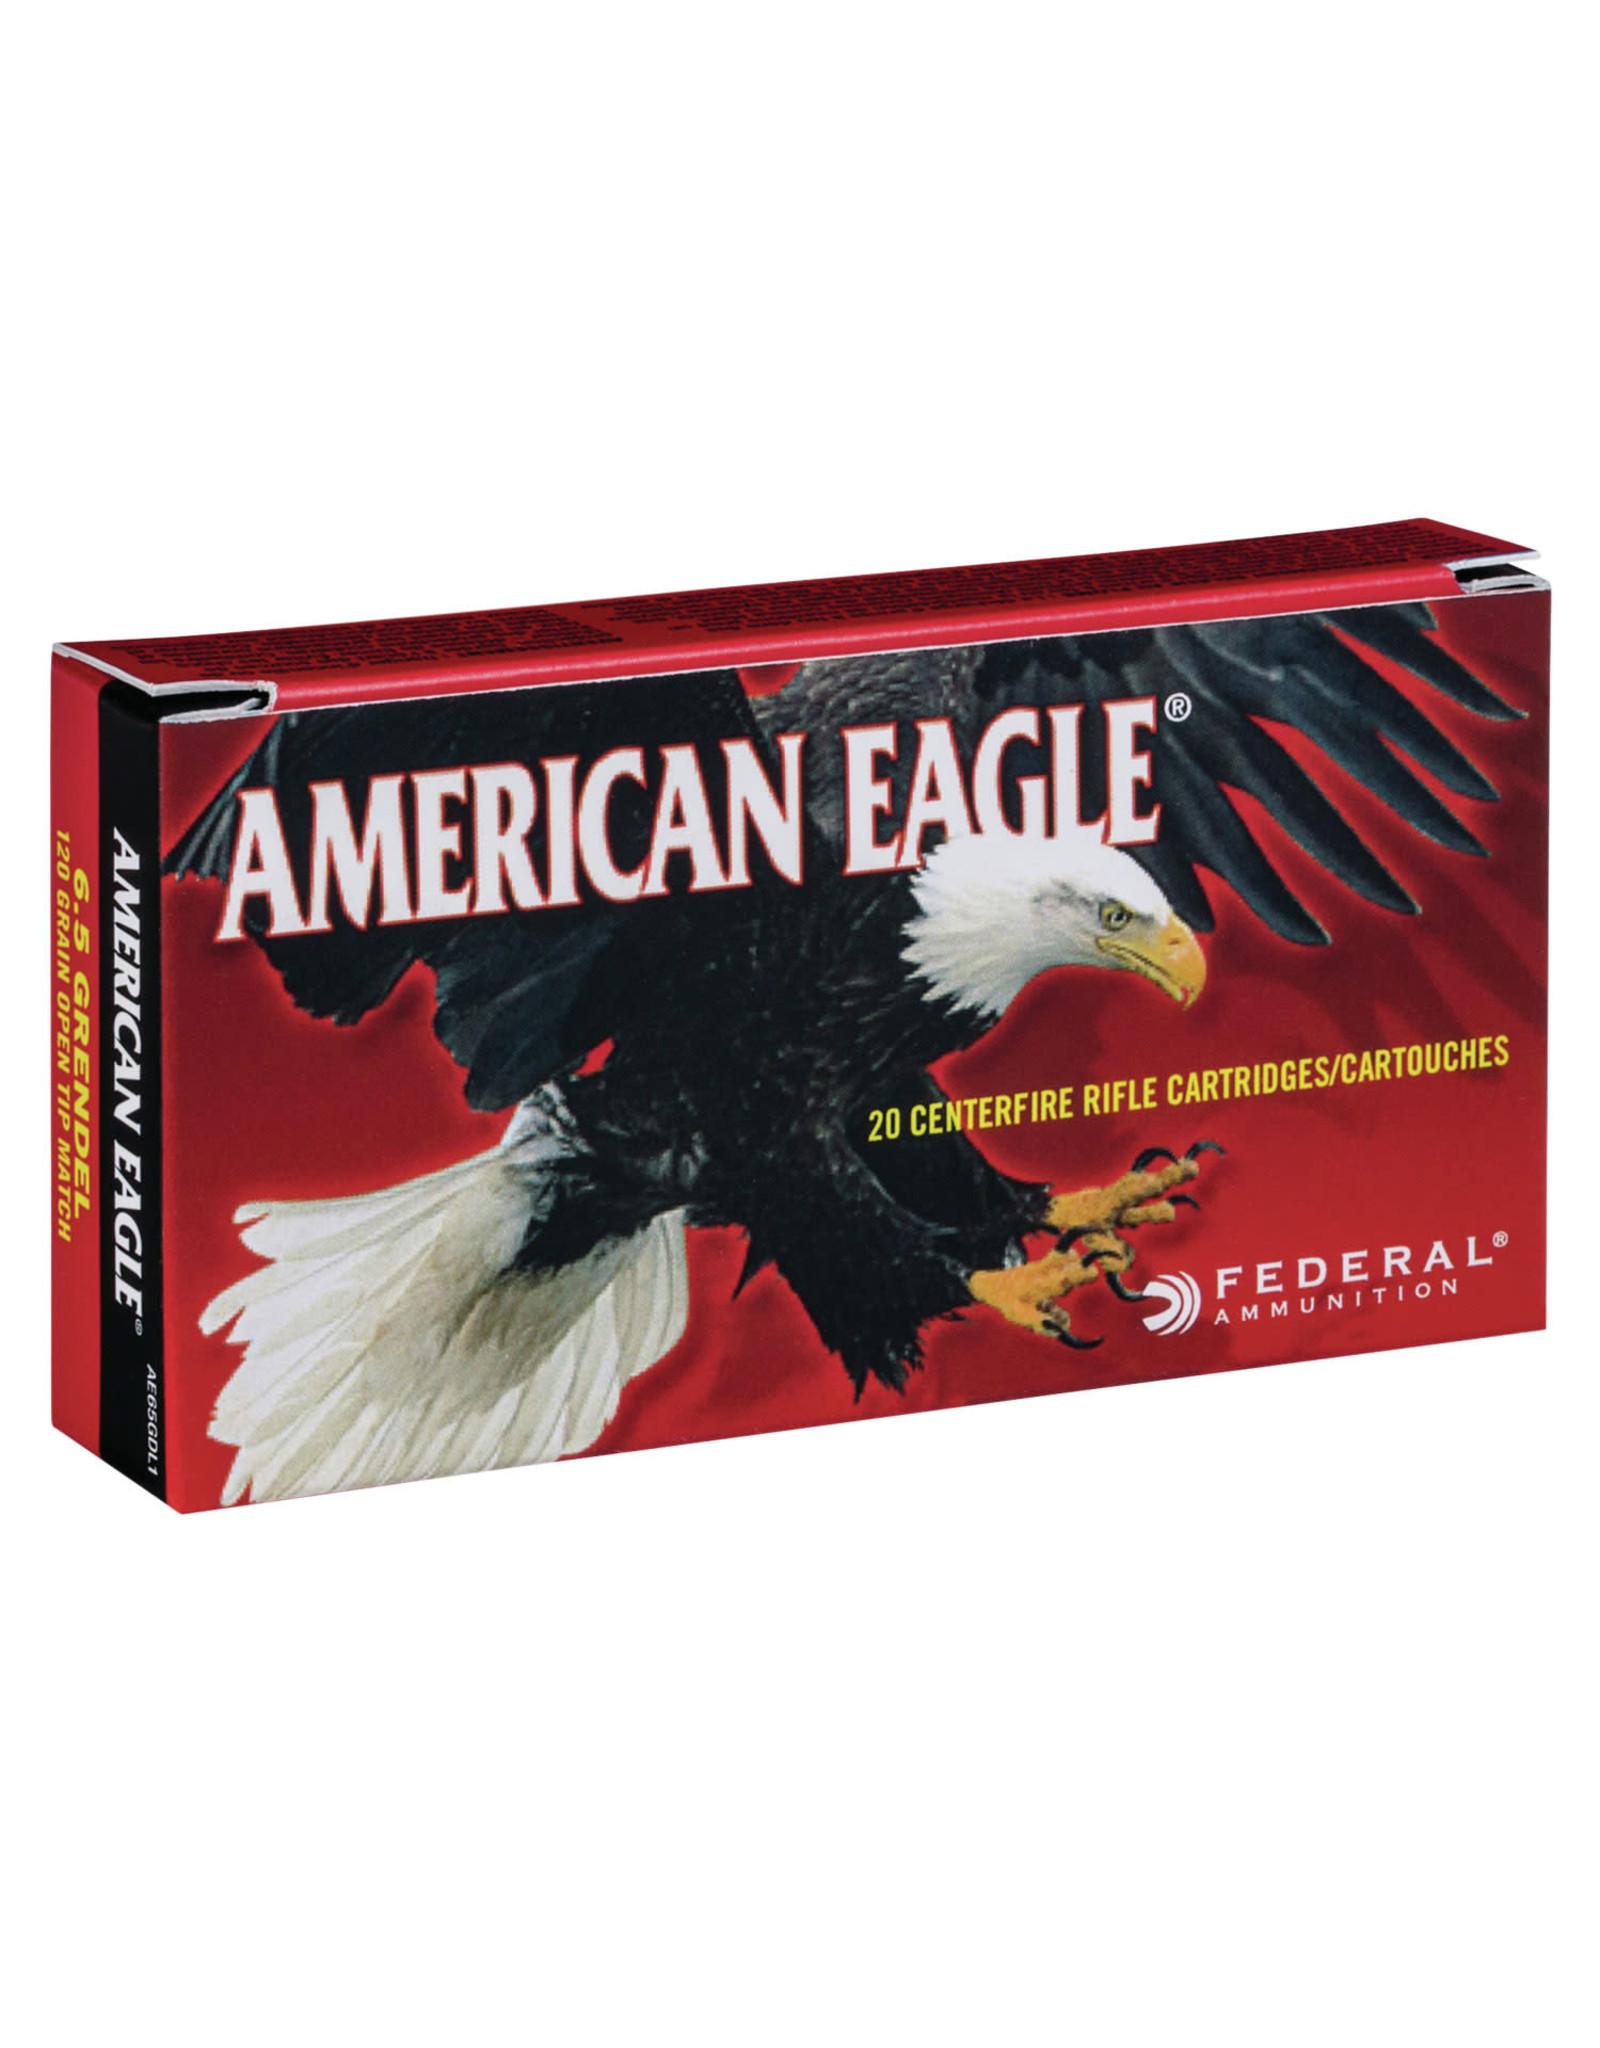 Federal Federal 6.5 Grendel 120 Gr Open Tip Match - 20 Count